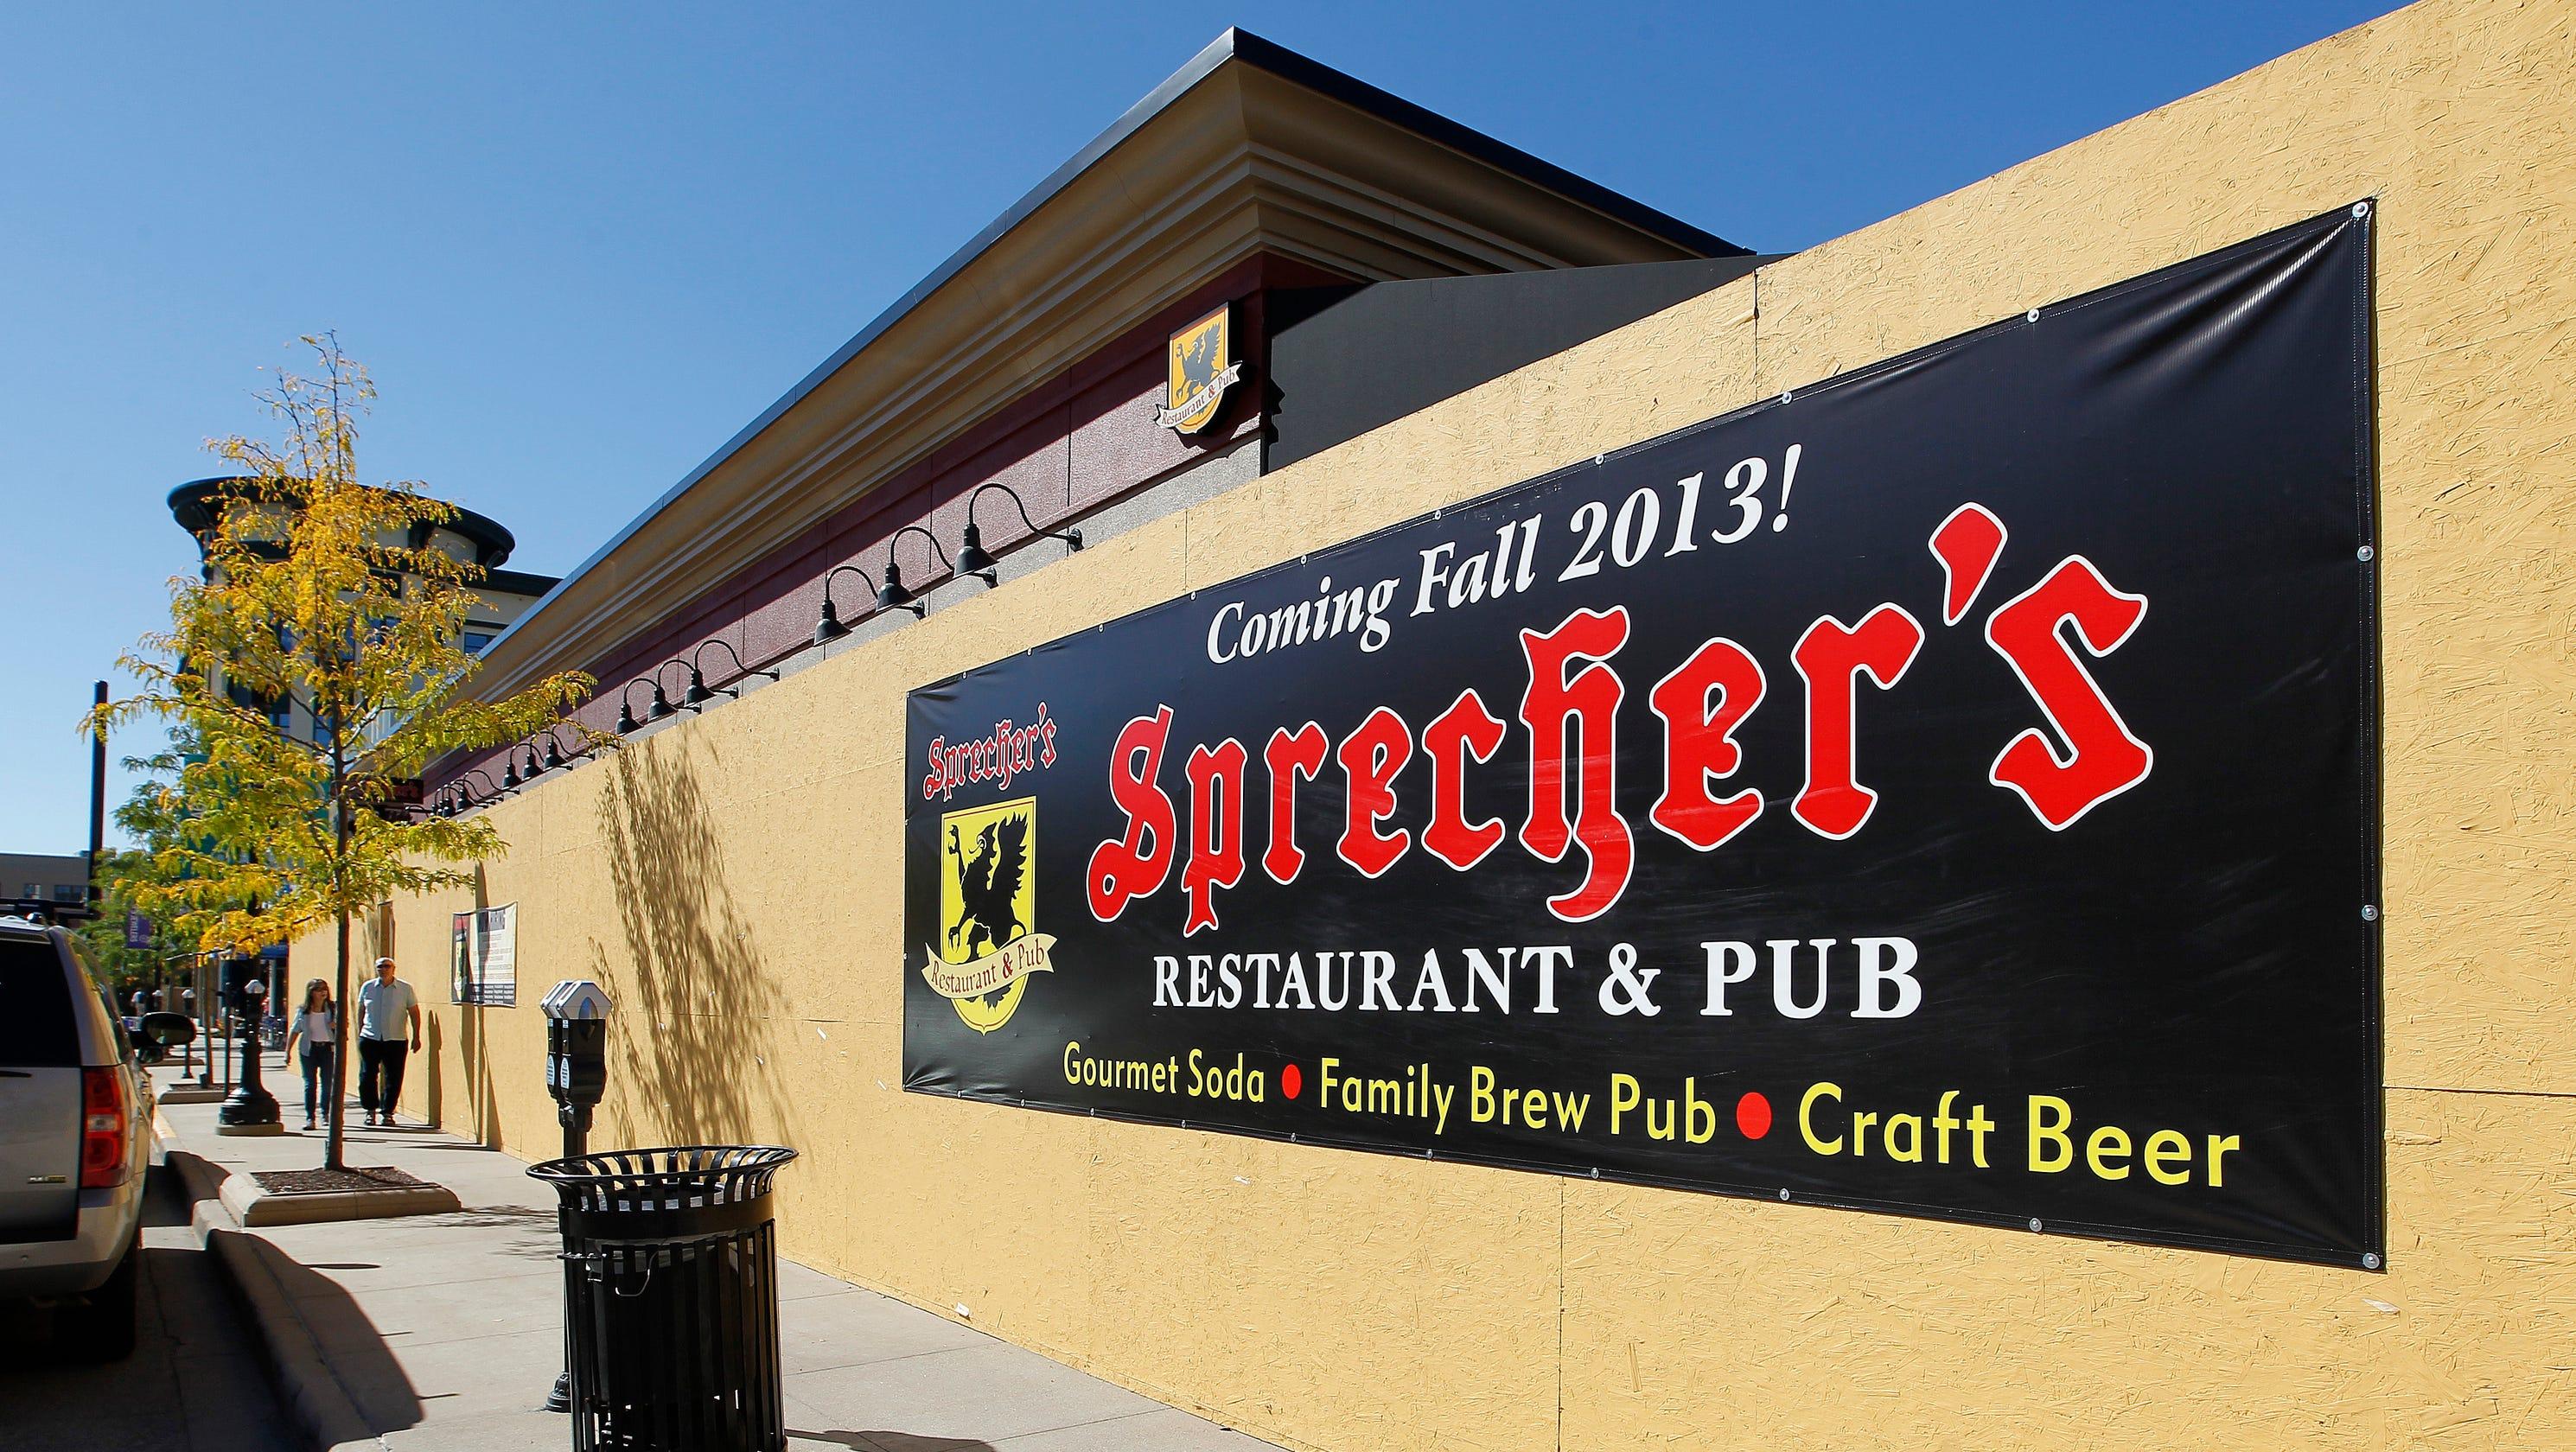 7fec1bf70bf Sprecher s Restaurant   Pub at Bayshore announces it is closing